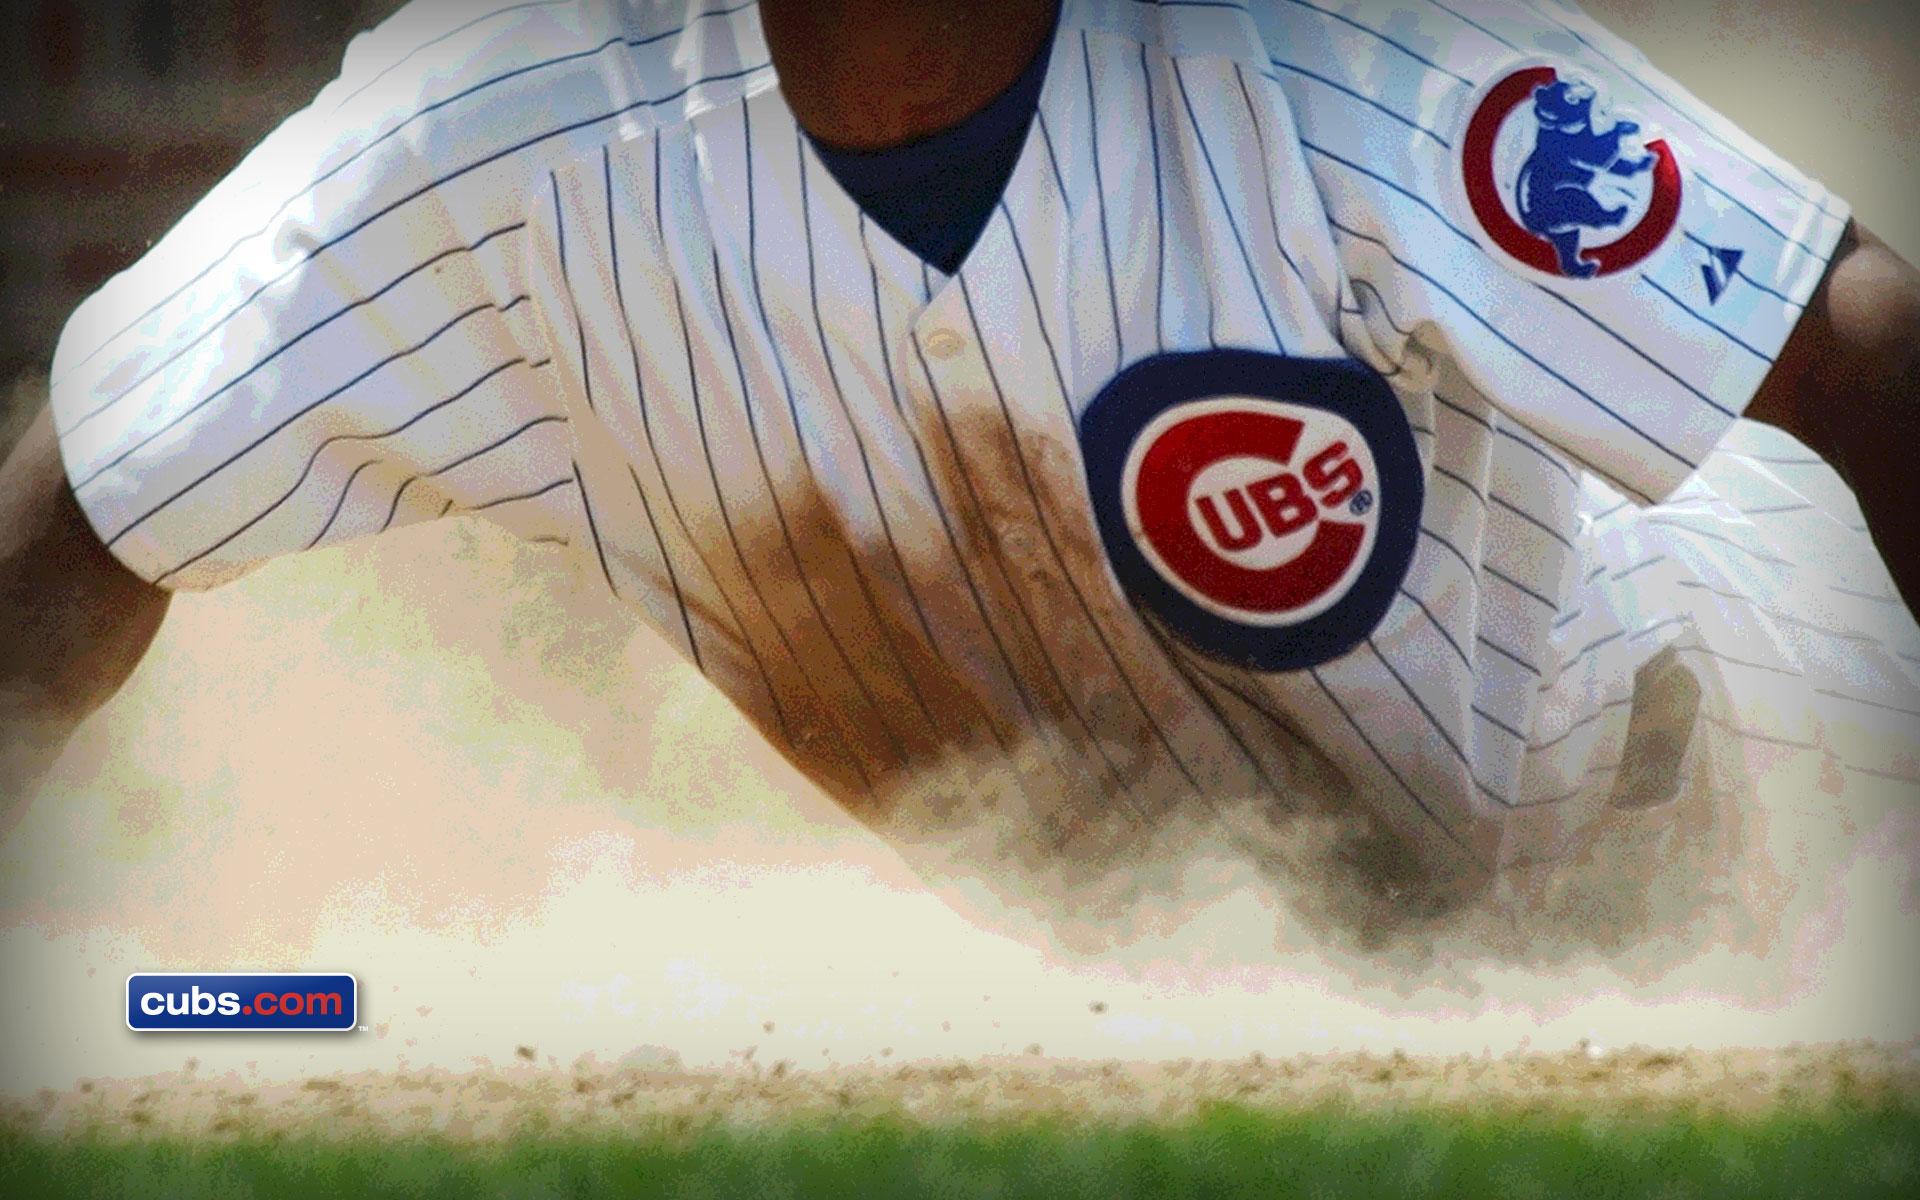 CHICAGO CUBS mlb baseball 51 wallpaper 1920x1200 232570 1920x1200